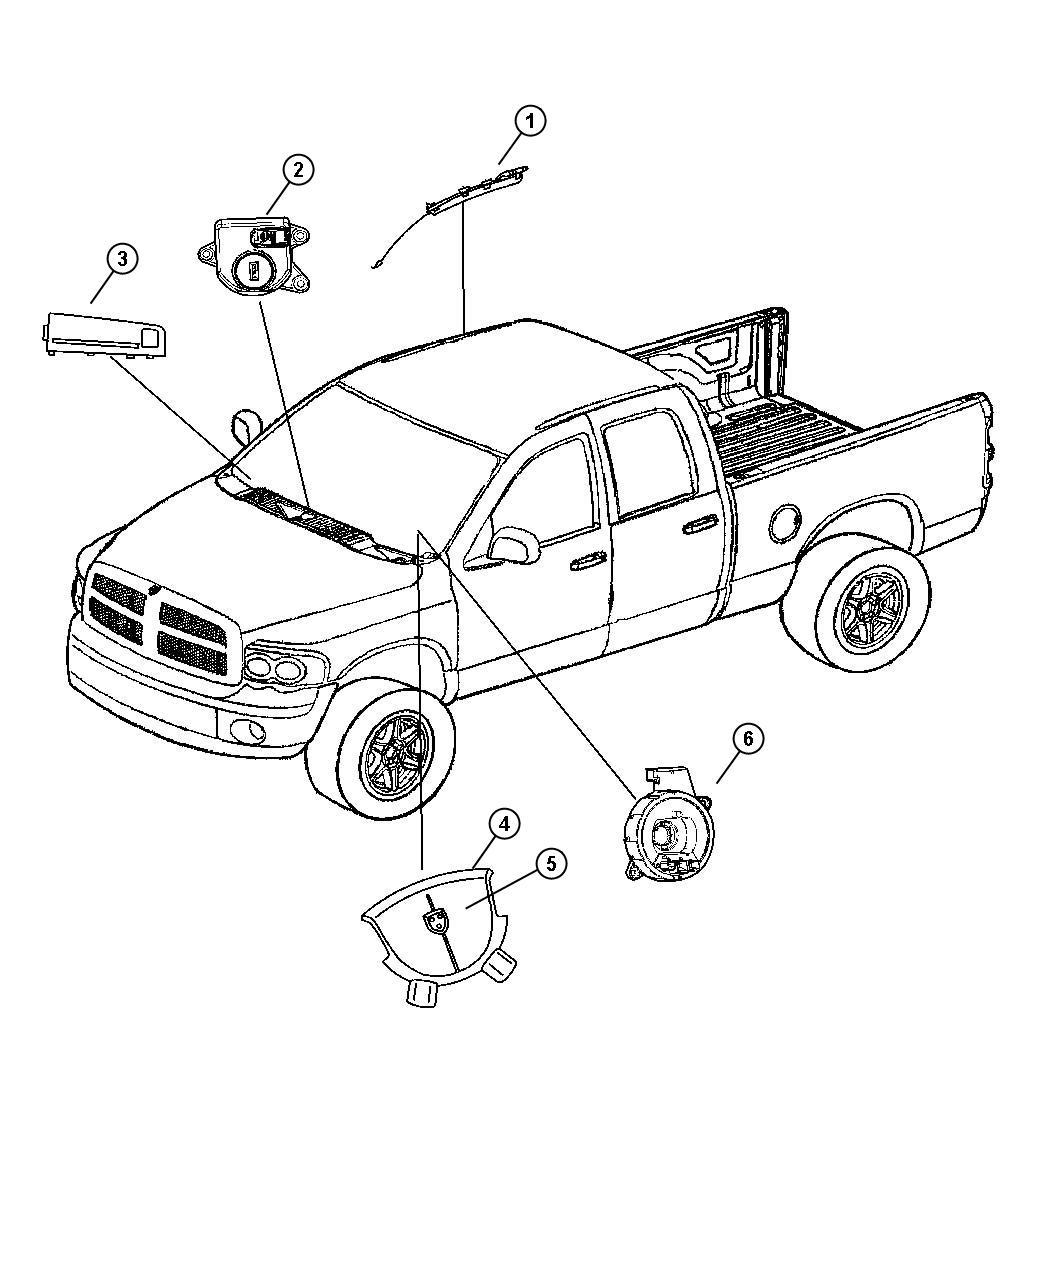 Dodge Ram Switch Passenger Airbag Disarm